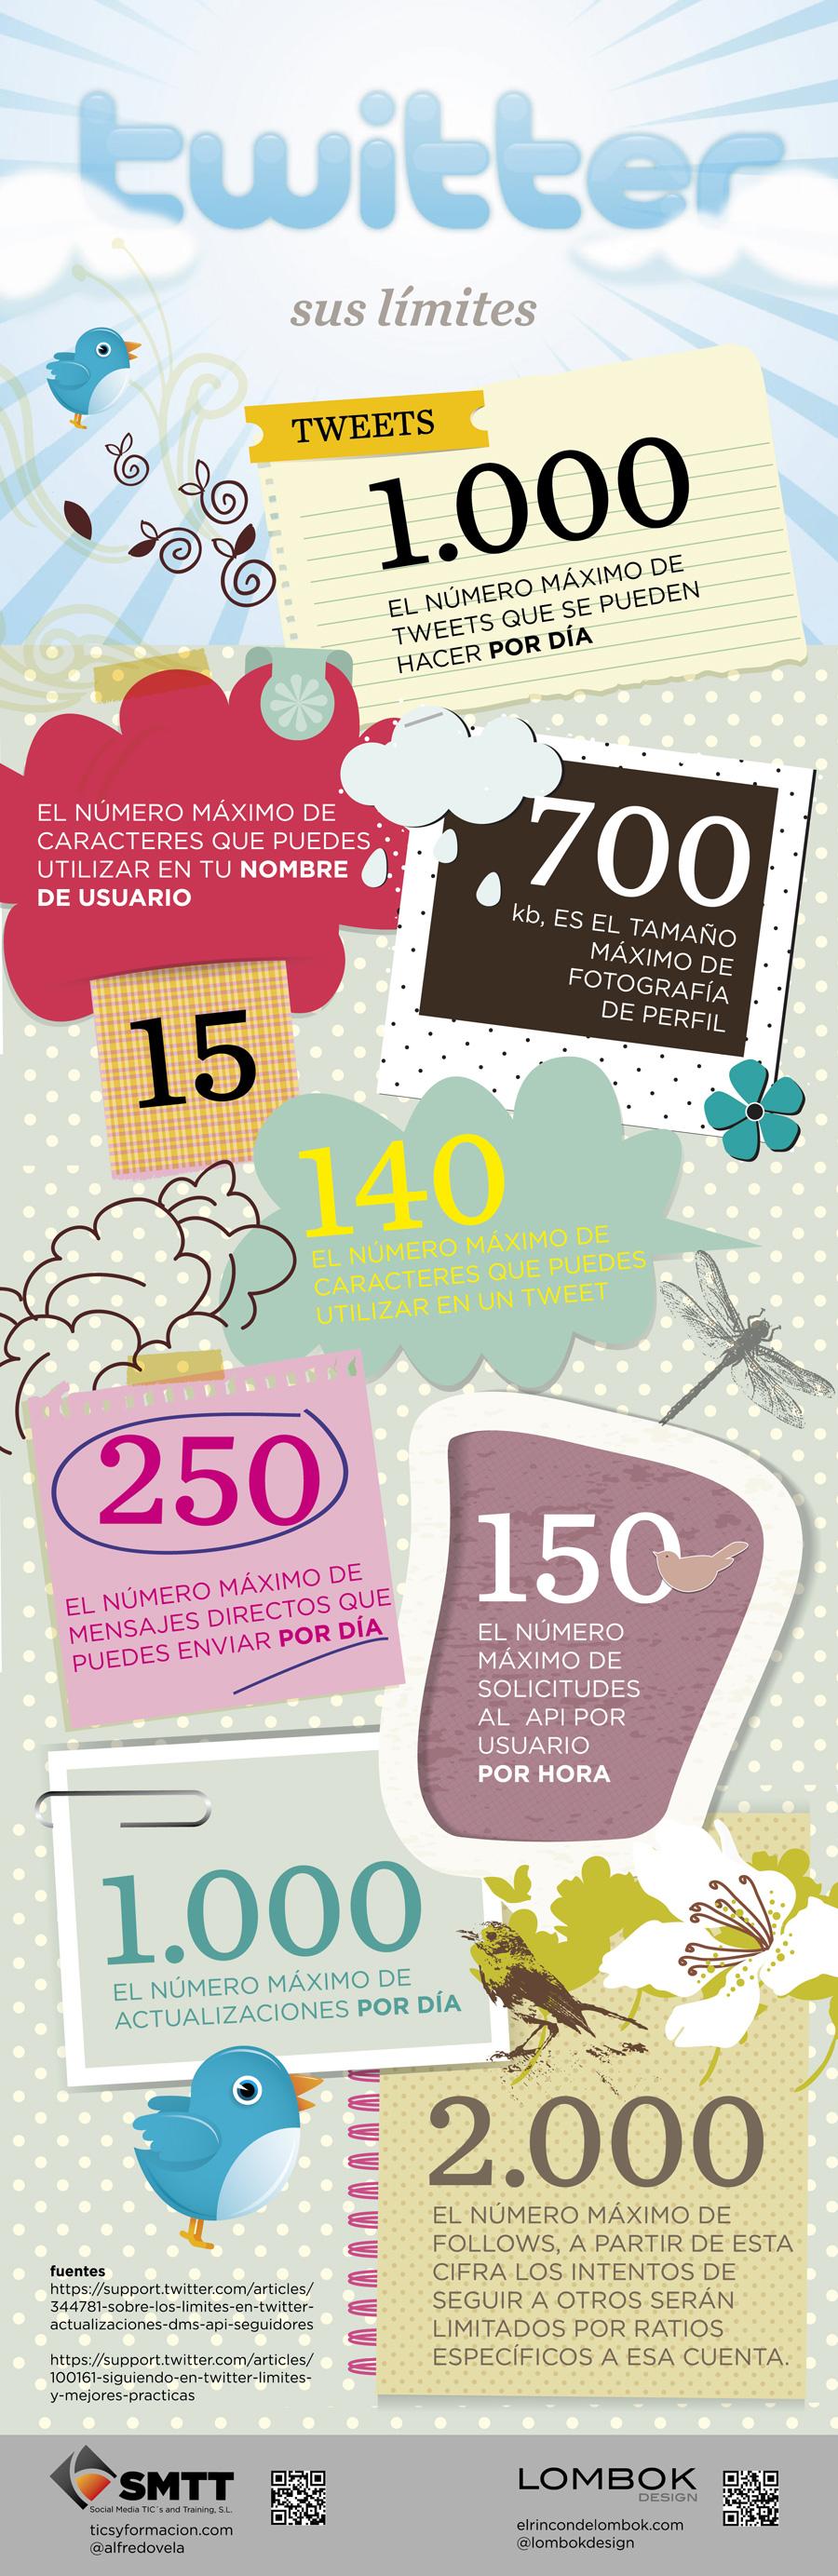 loslimitesdetwitter spanish